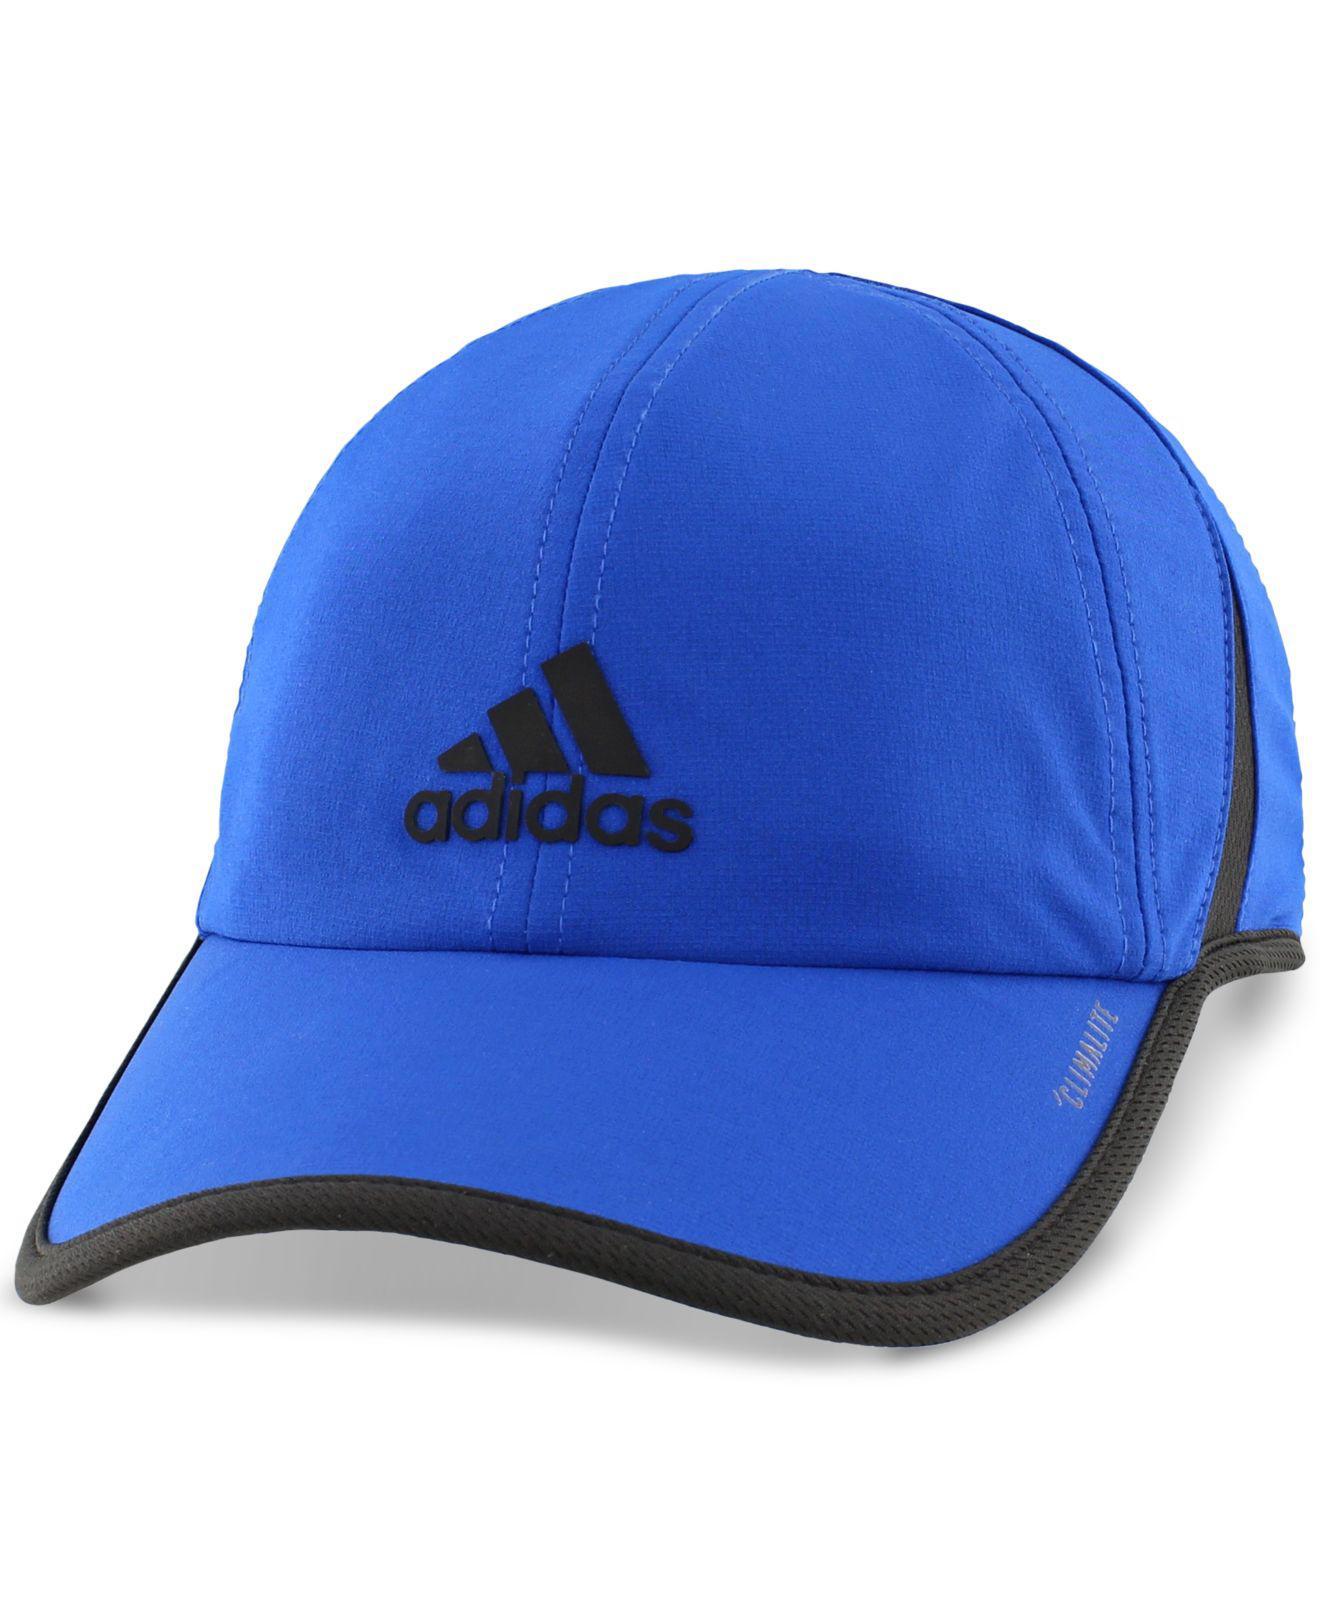 f575468abb83 Gallery. Previously sold at  Macy s · Men s Snapbacks Men s Team Hats ...